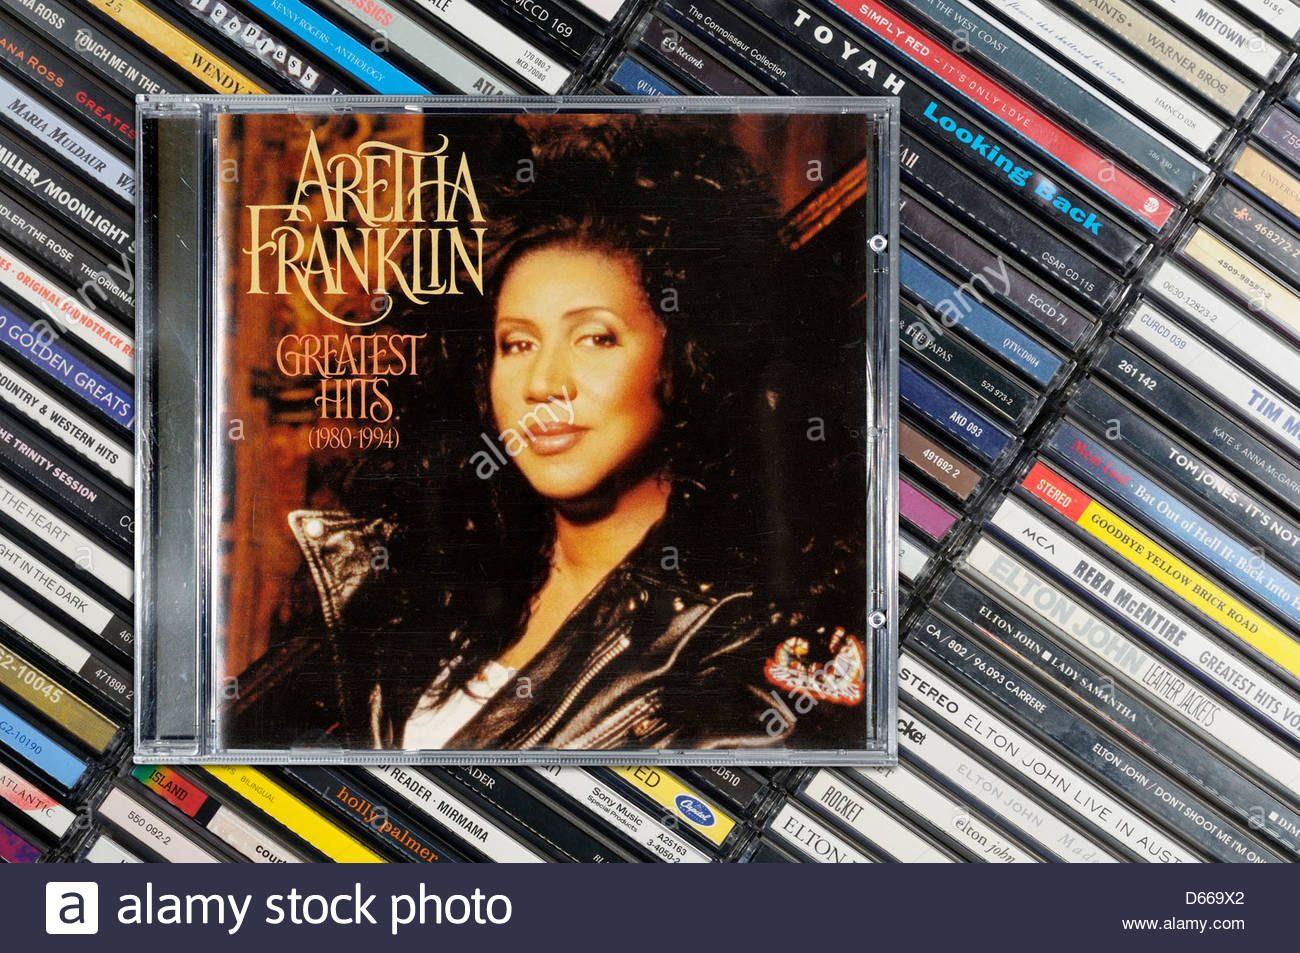 Aretha Franklin álbum Greatest Hits, amontonado en casos de CD de música, Inglaterra Foto de stock